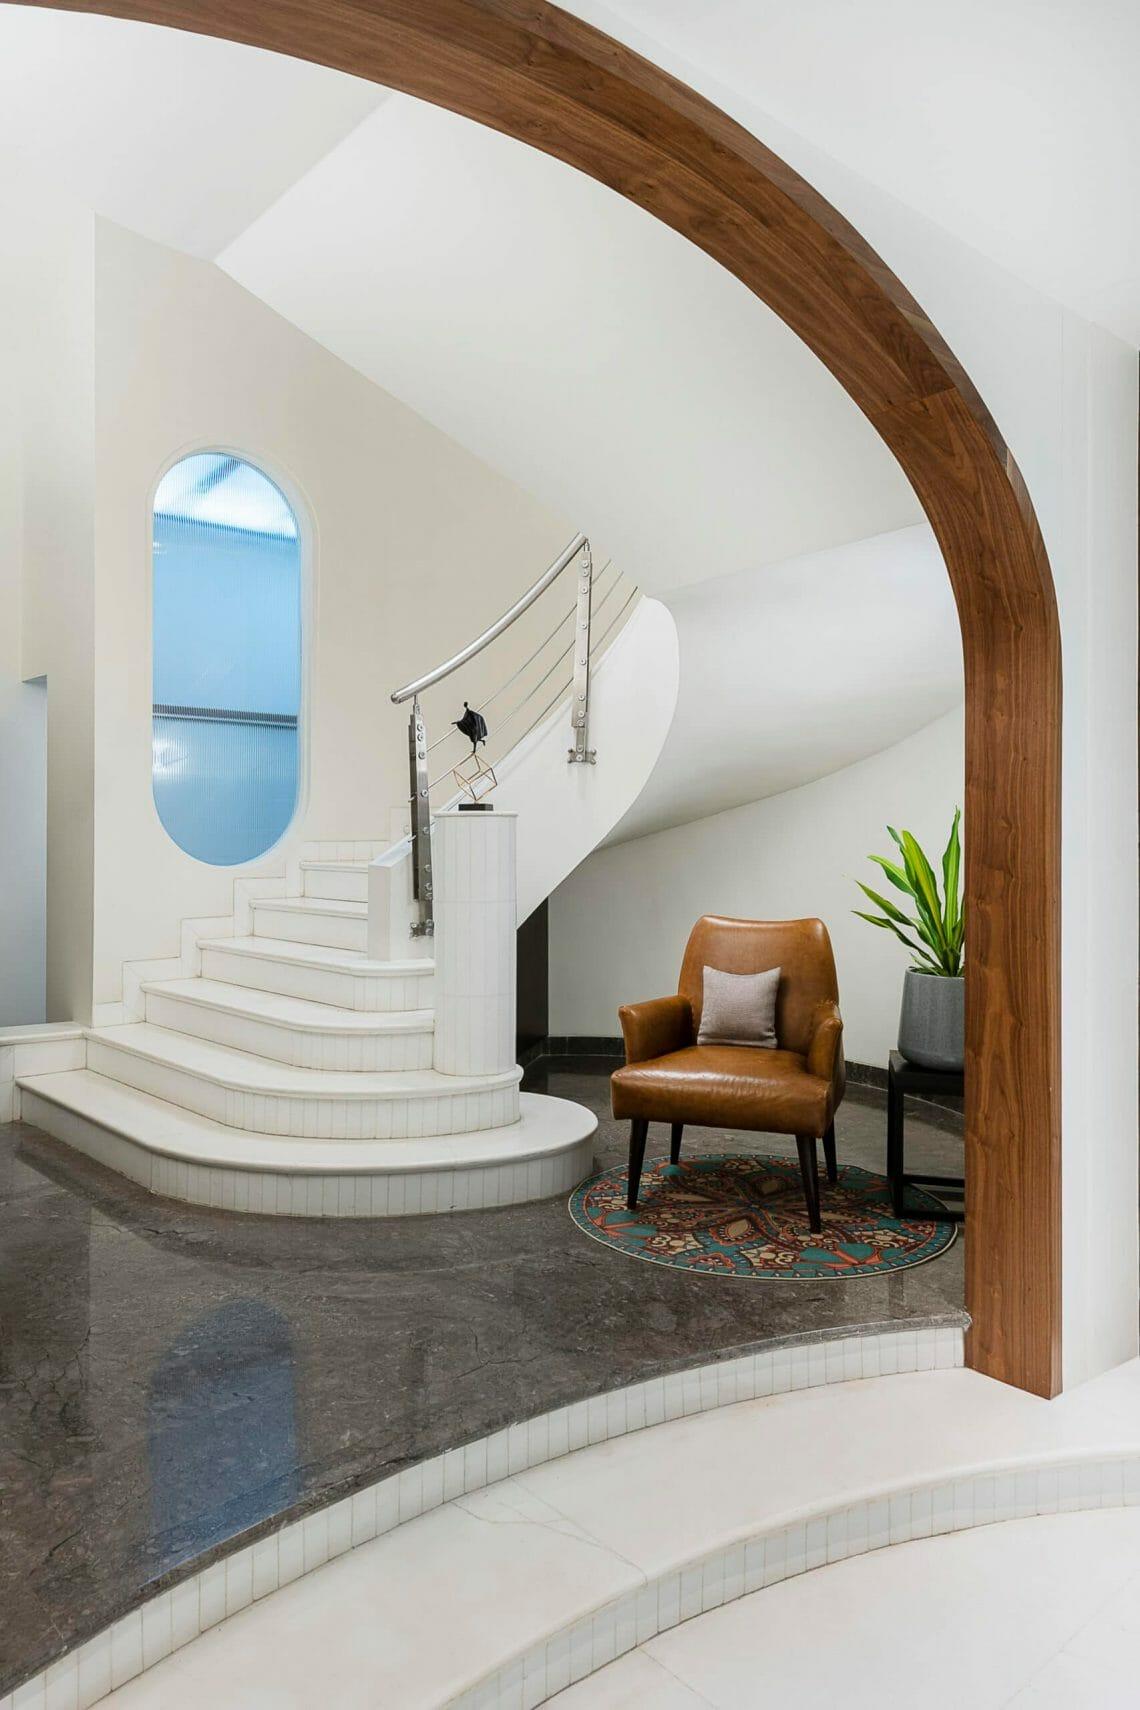 The Arch Studio